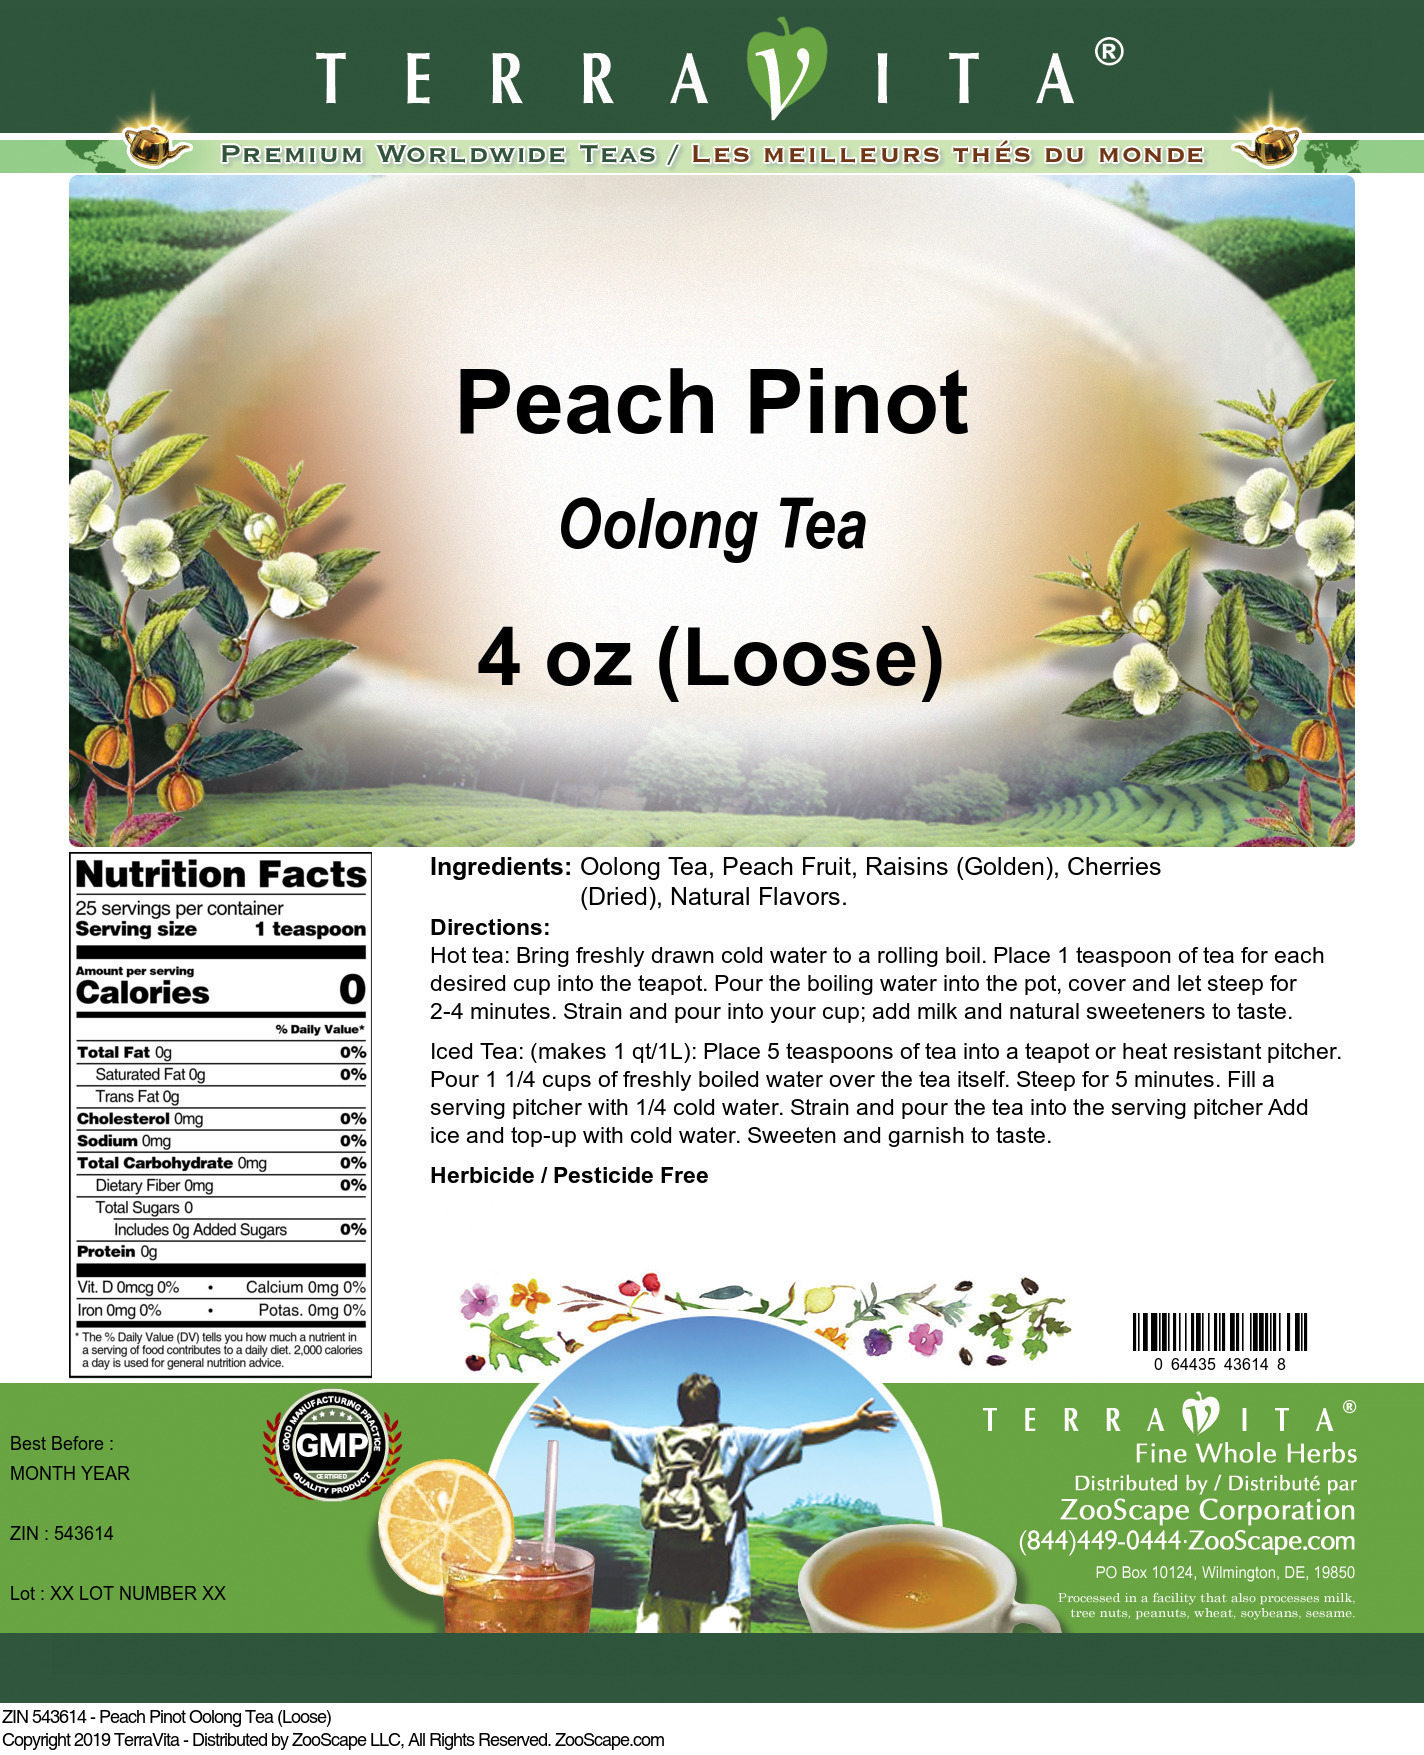 Peach Pinot Oolong Tea (Loose)